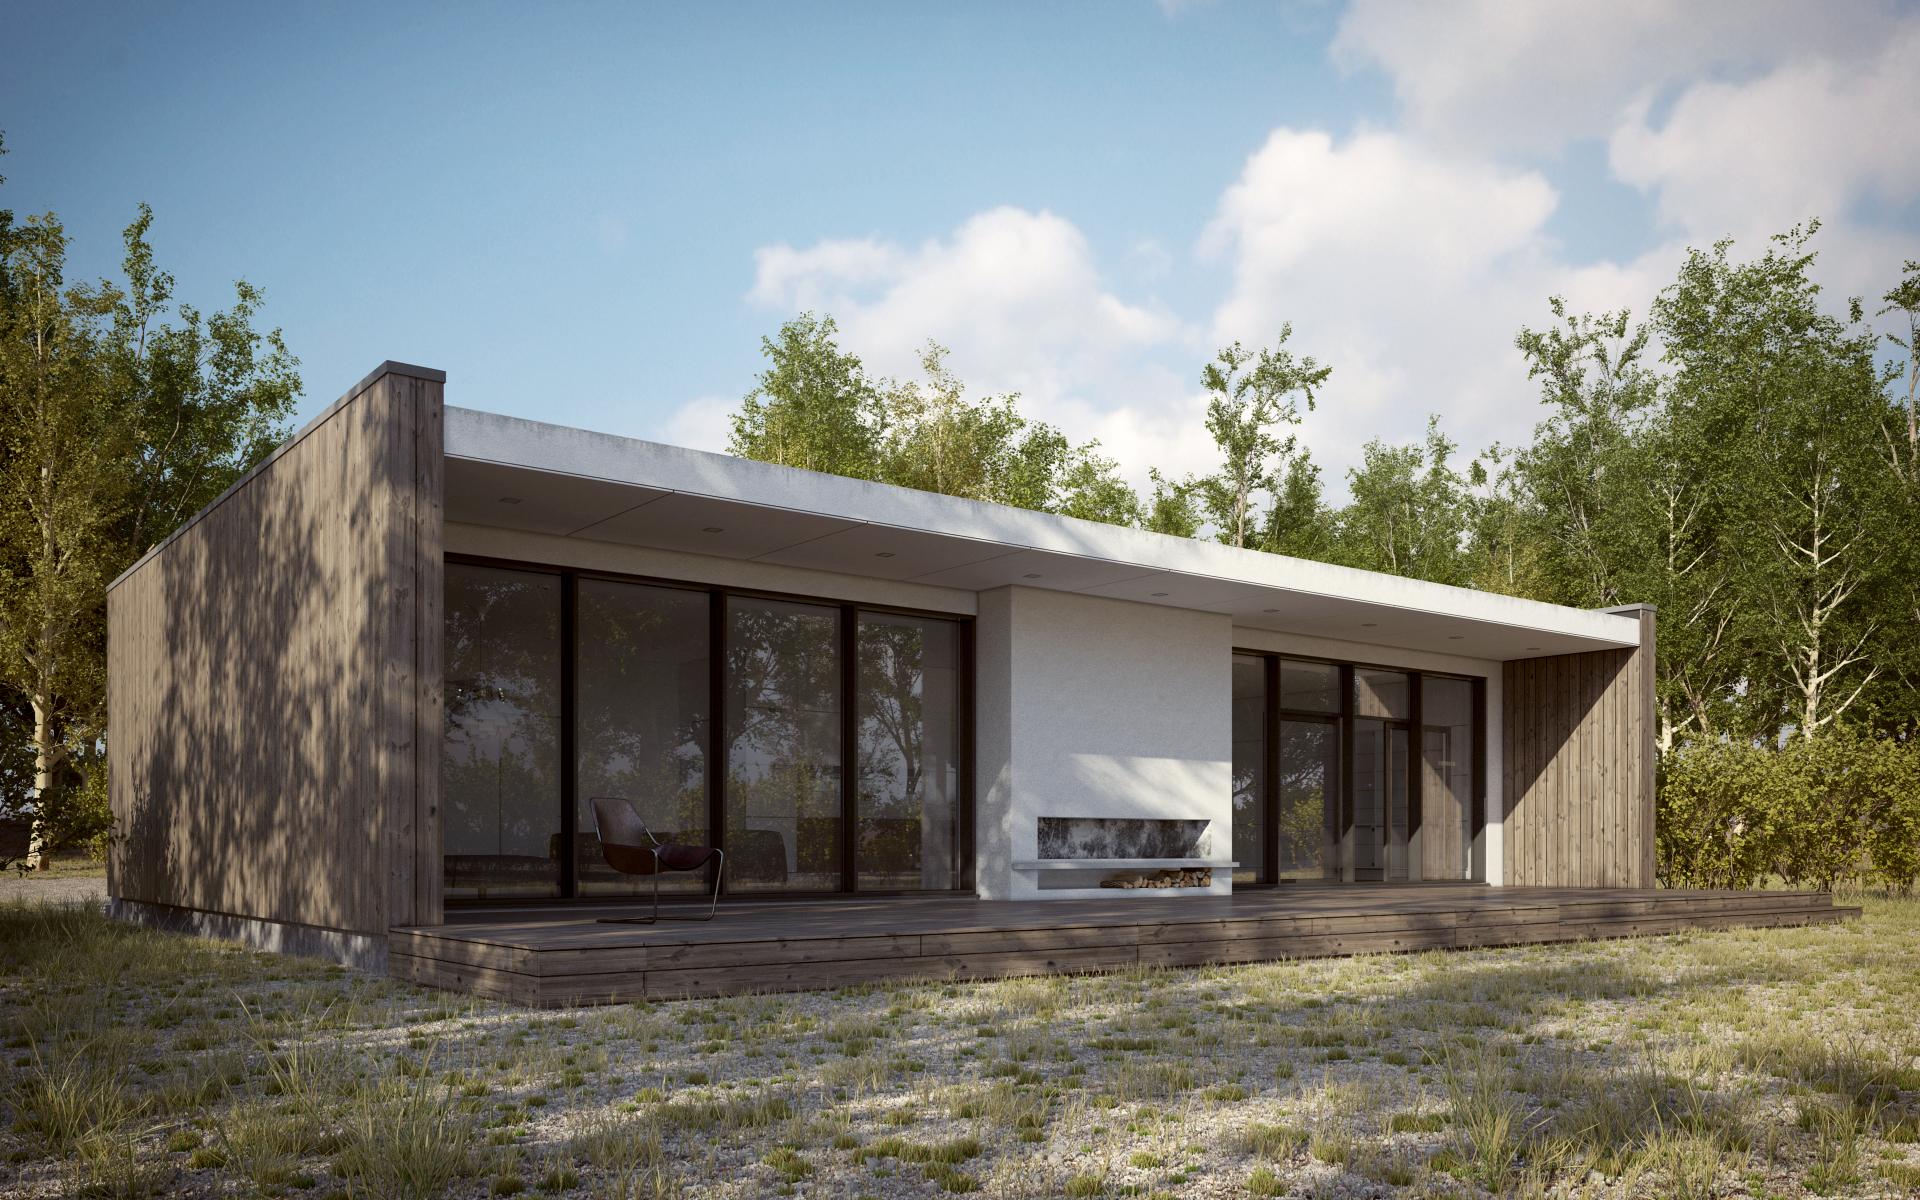 Best Bathroom Remodel Ideas Scandinavian Summer House By 3dstudija Showme Design